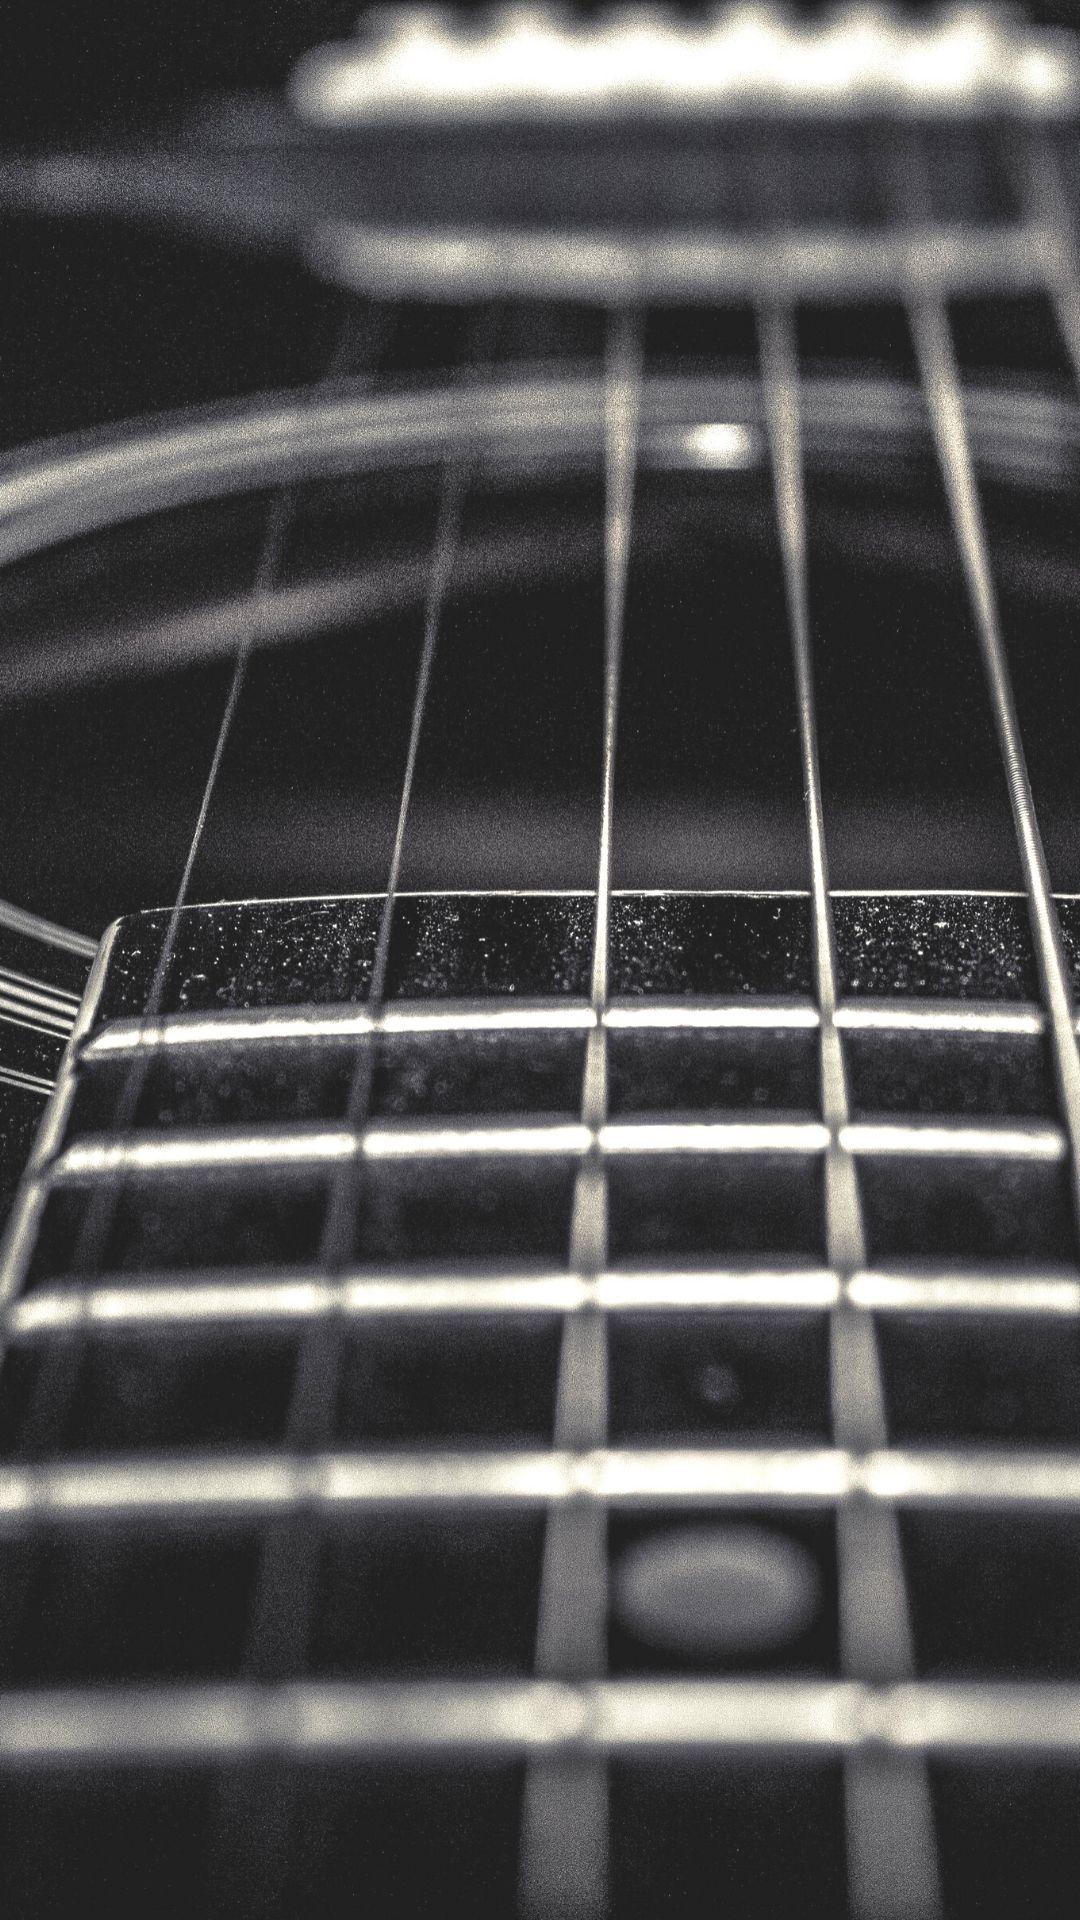 image-blog-3-reportage-corporate-adonis_guitare-studio-matpix